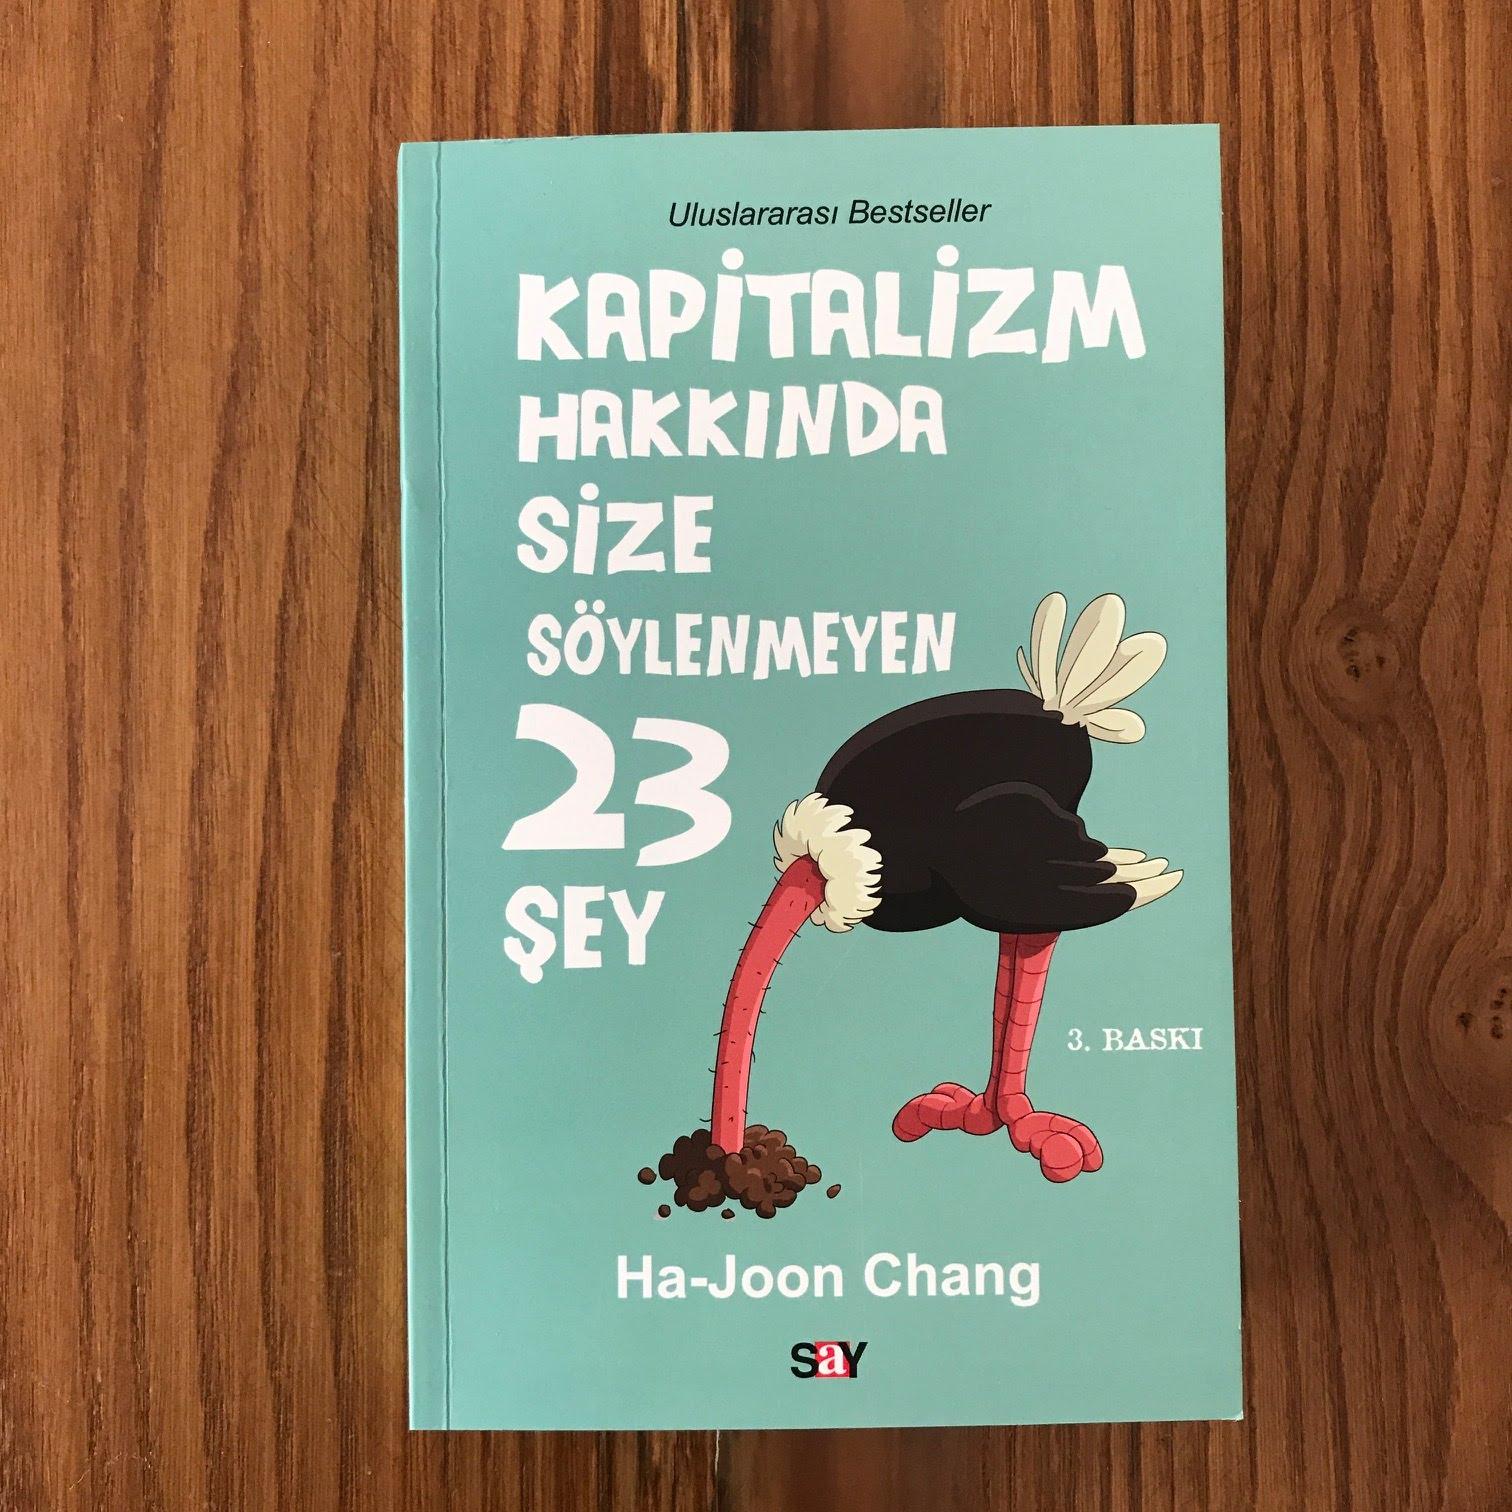 Kapitalizm Hakkinda Size Soylenmeyen 23 Sey (Kitap)